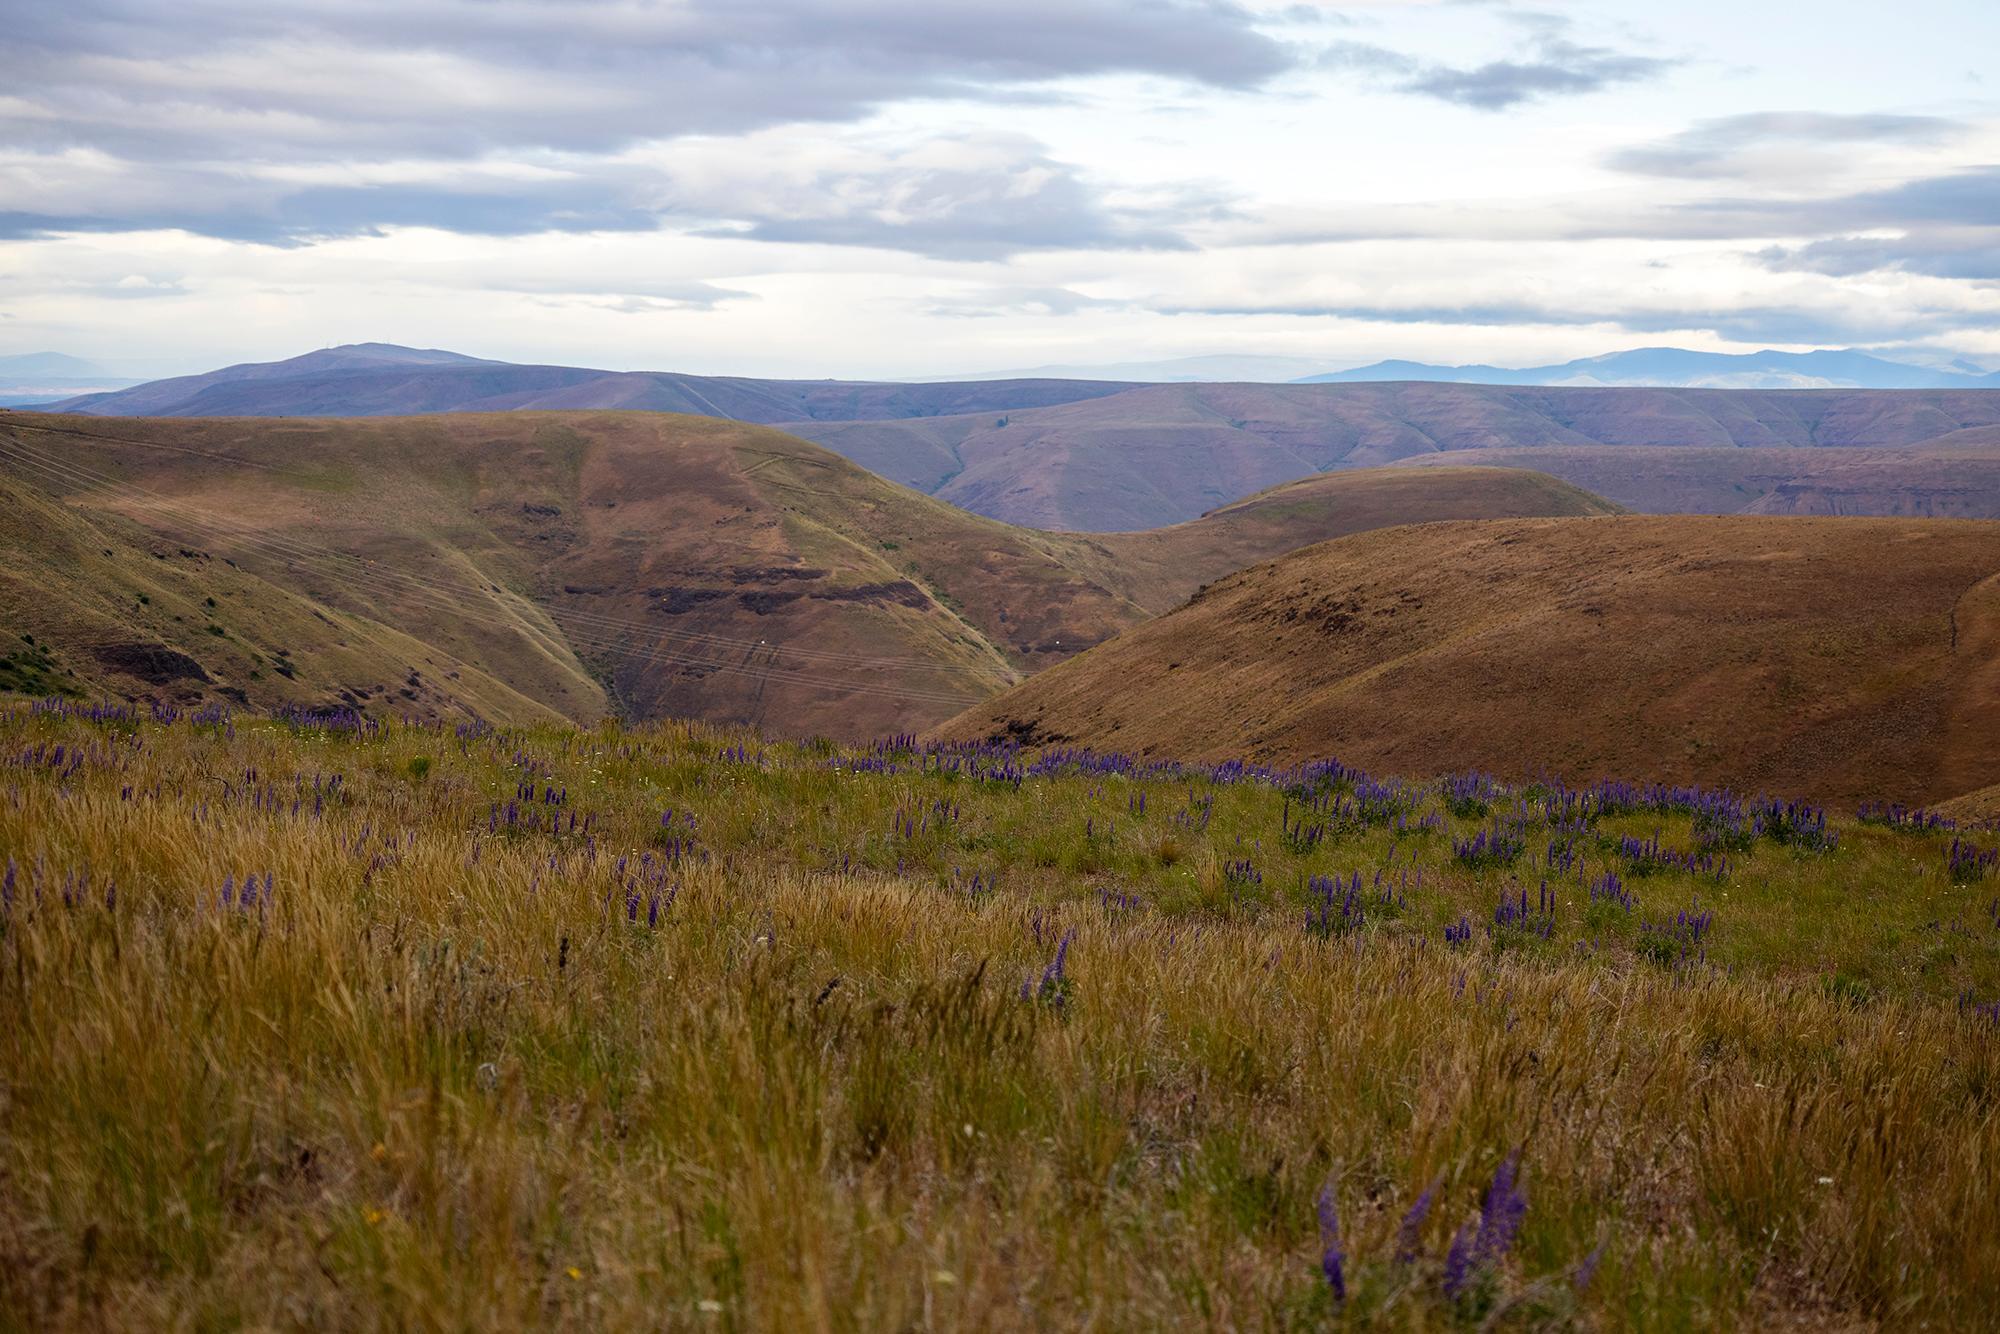 Nearing the Dalles. (Rugile Kaladyte)